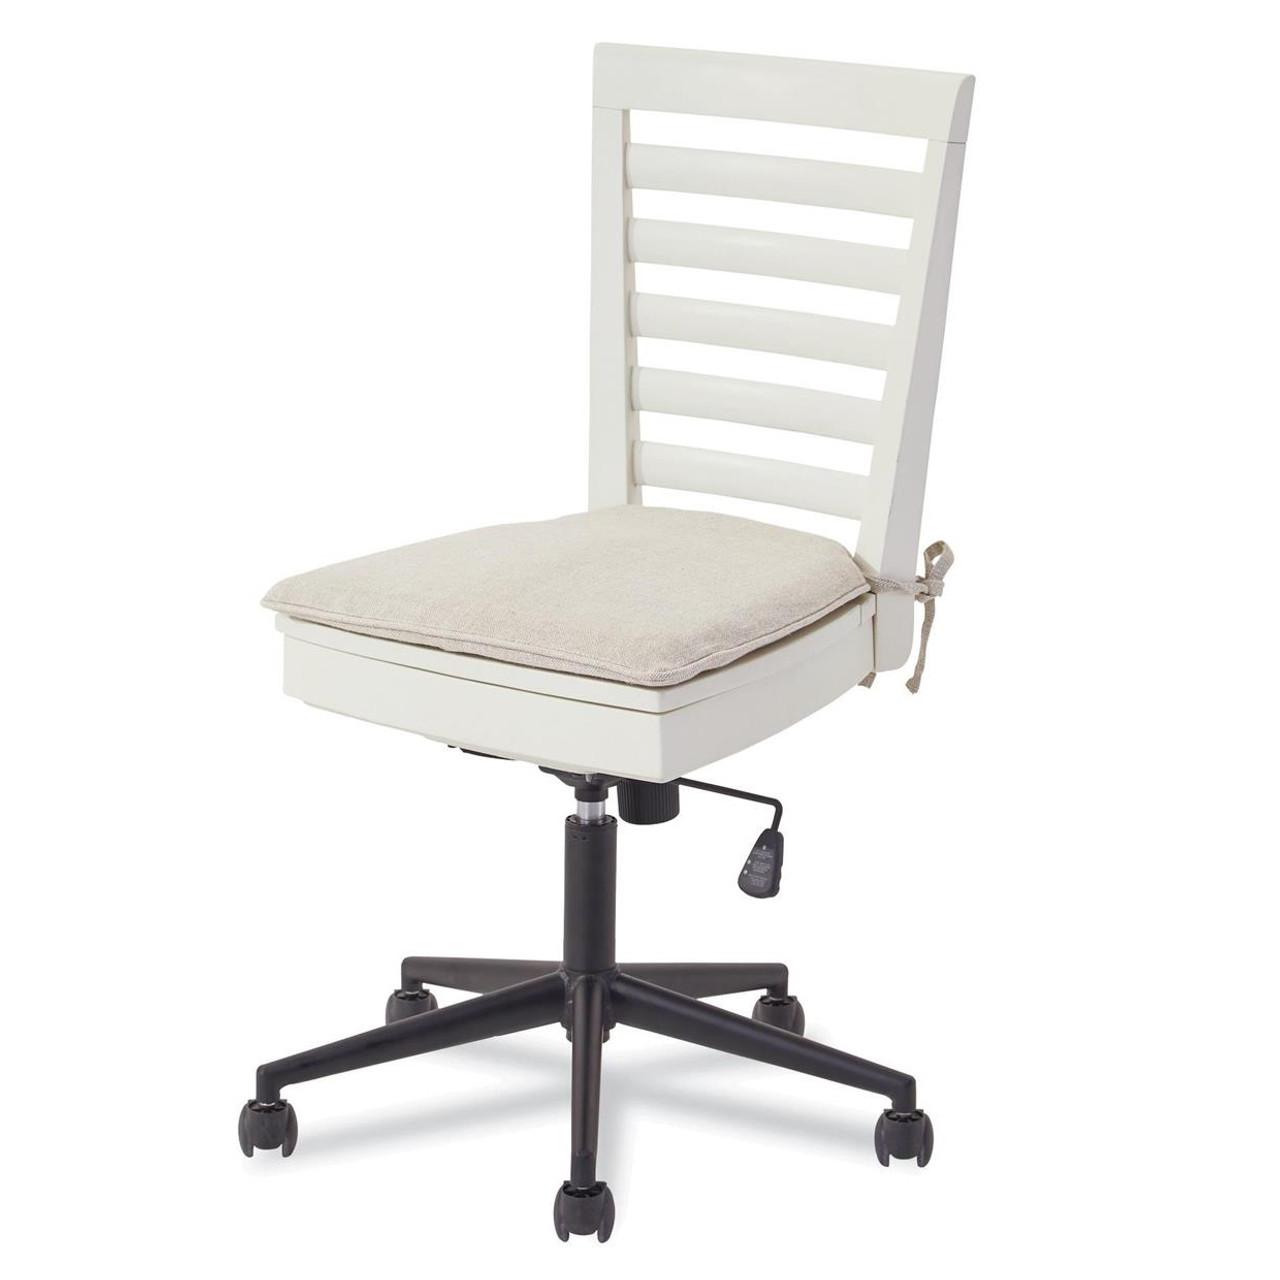 swivel chair child hanging gumtree perth myroom modern kids desk white zin home